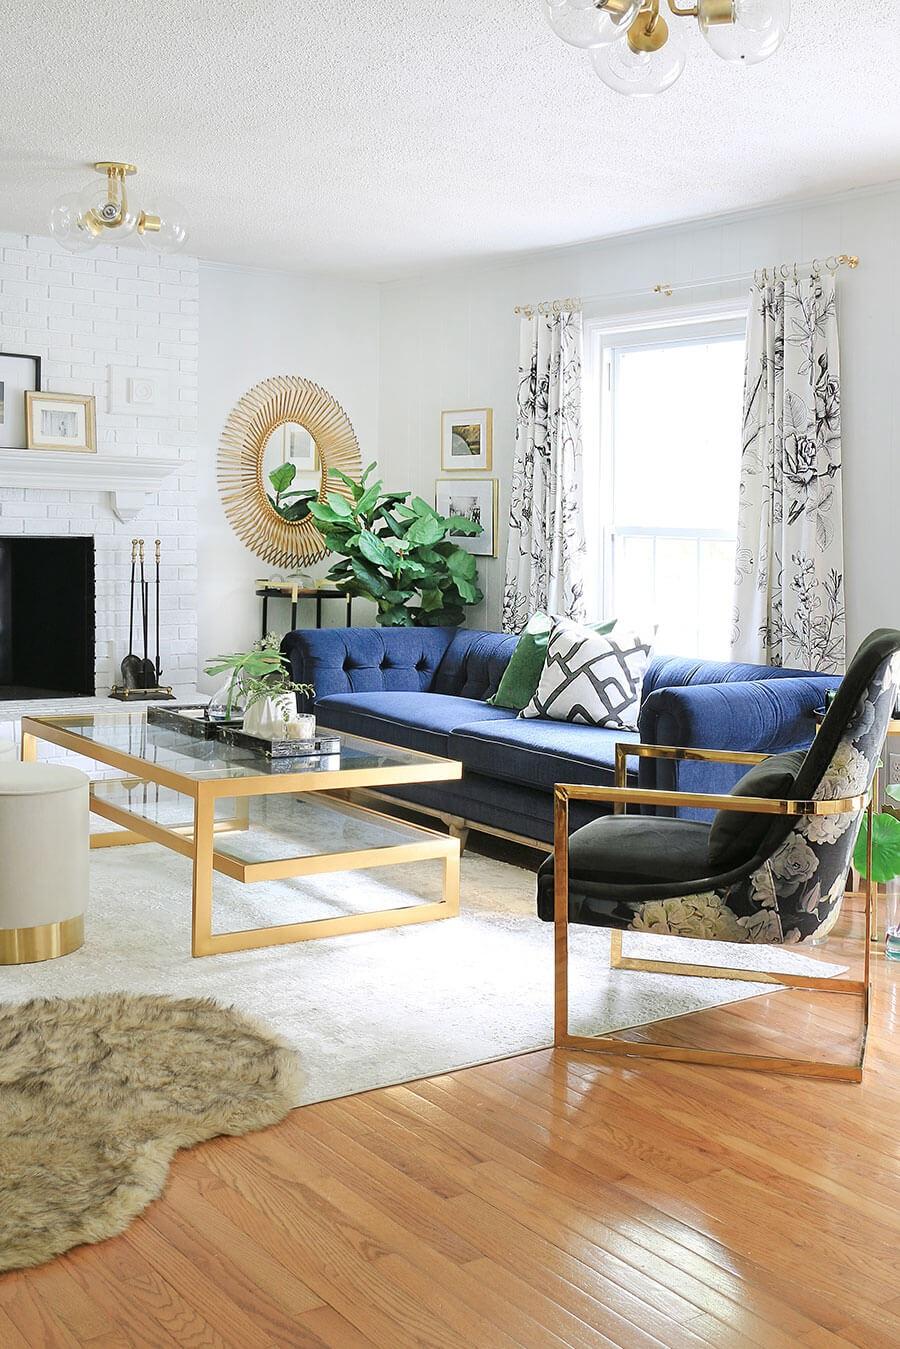 Home Made by Carmona